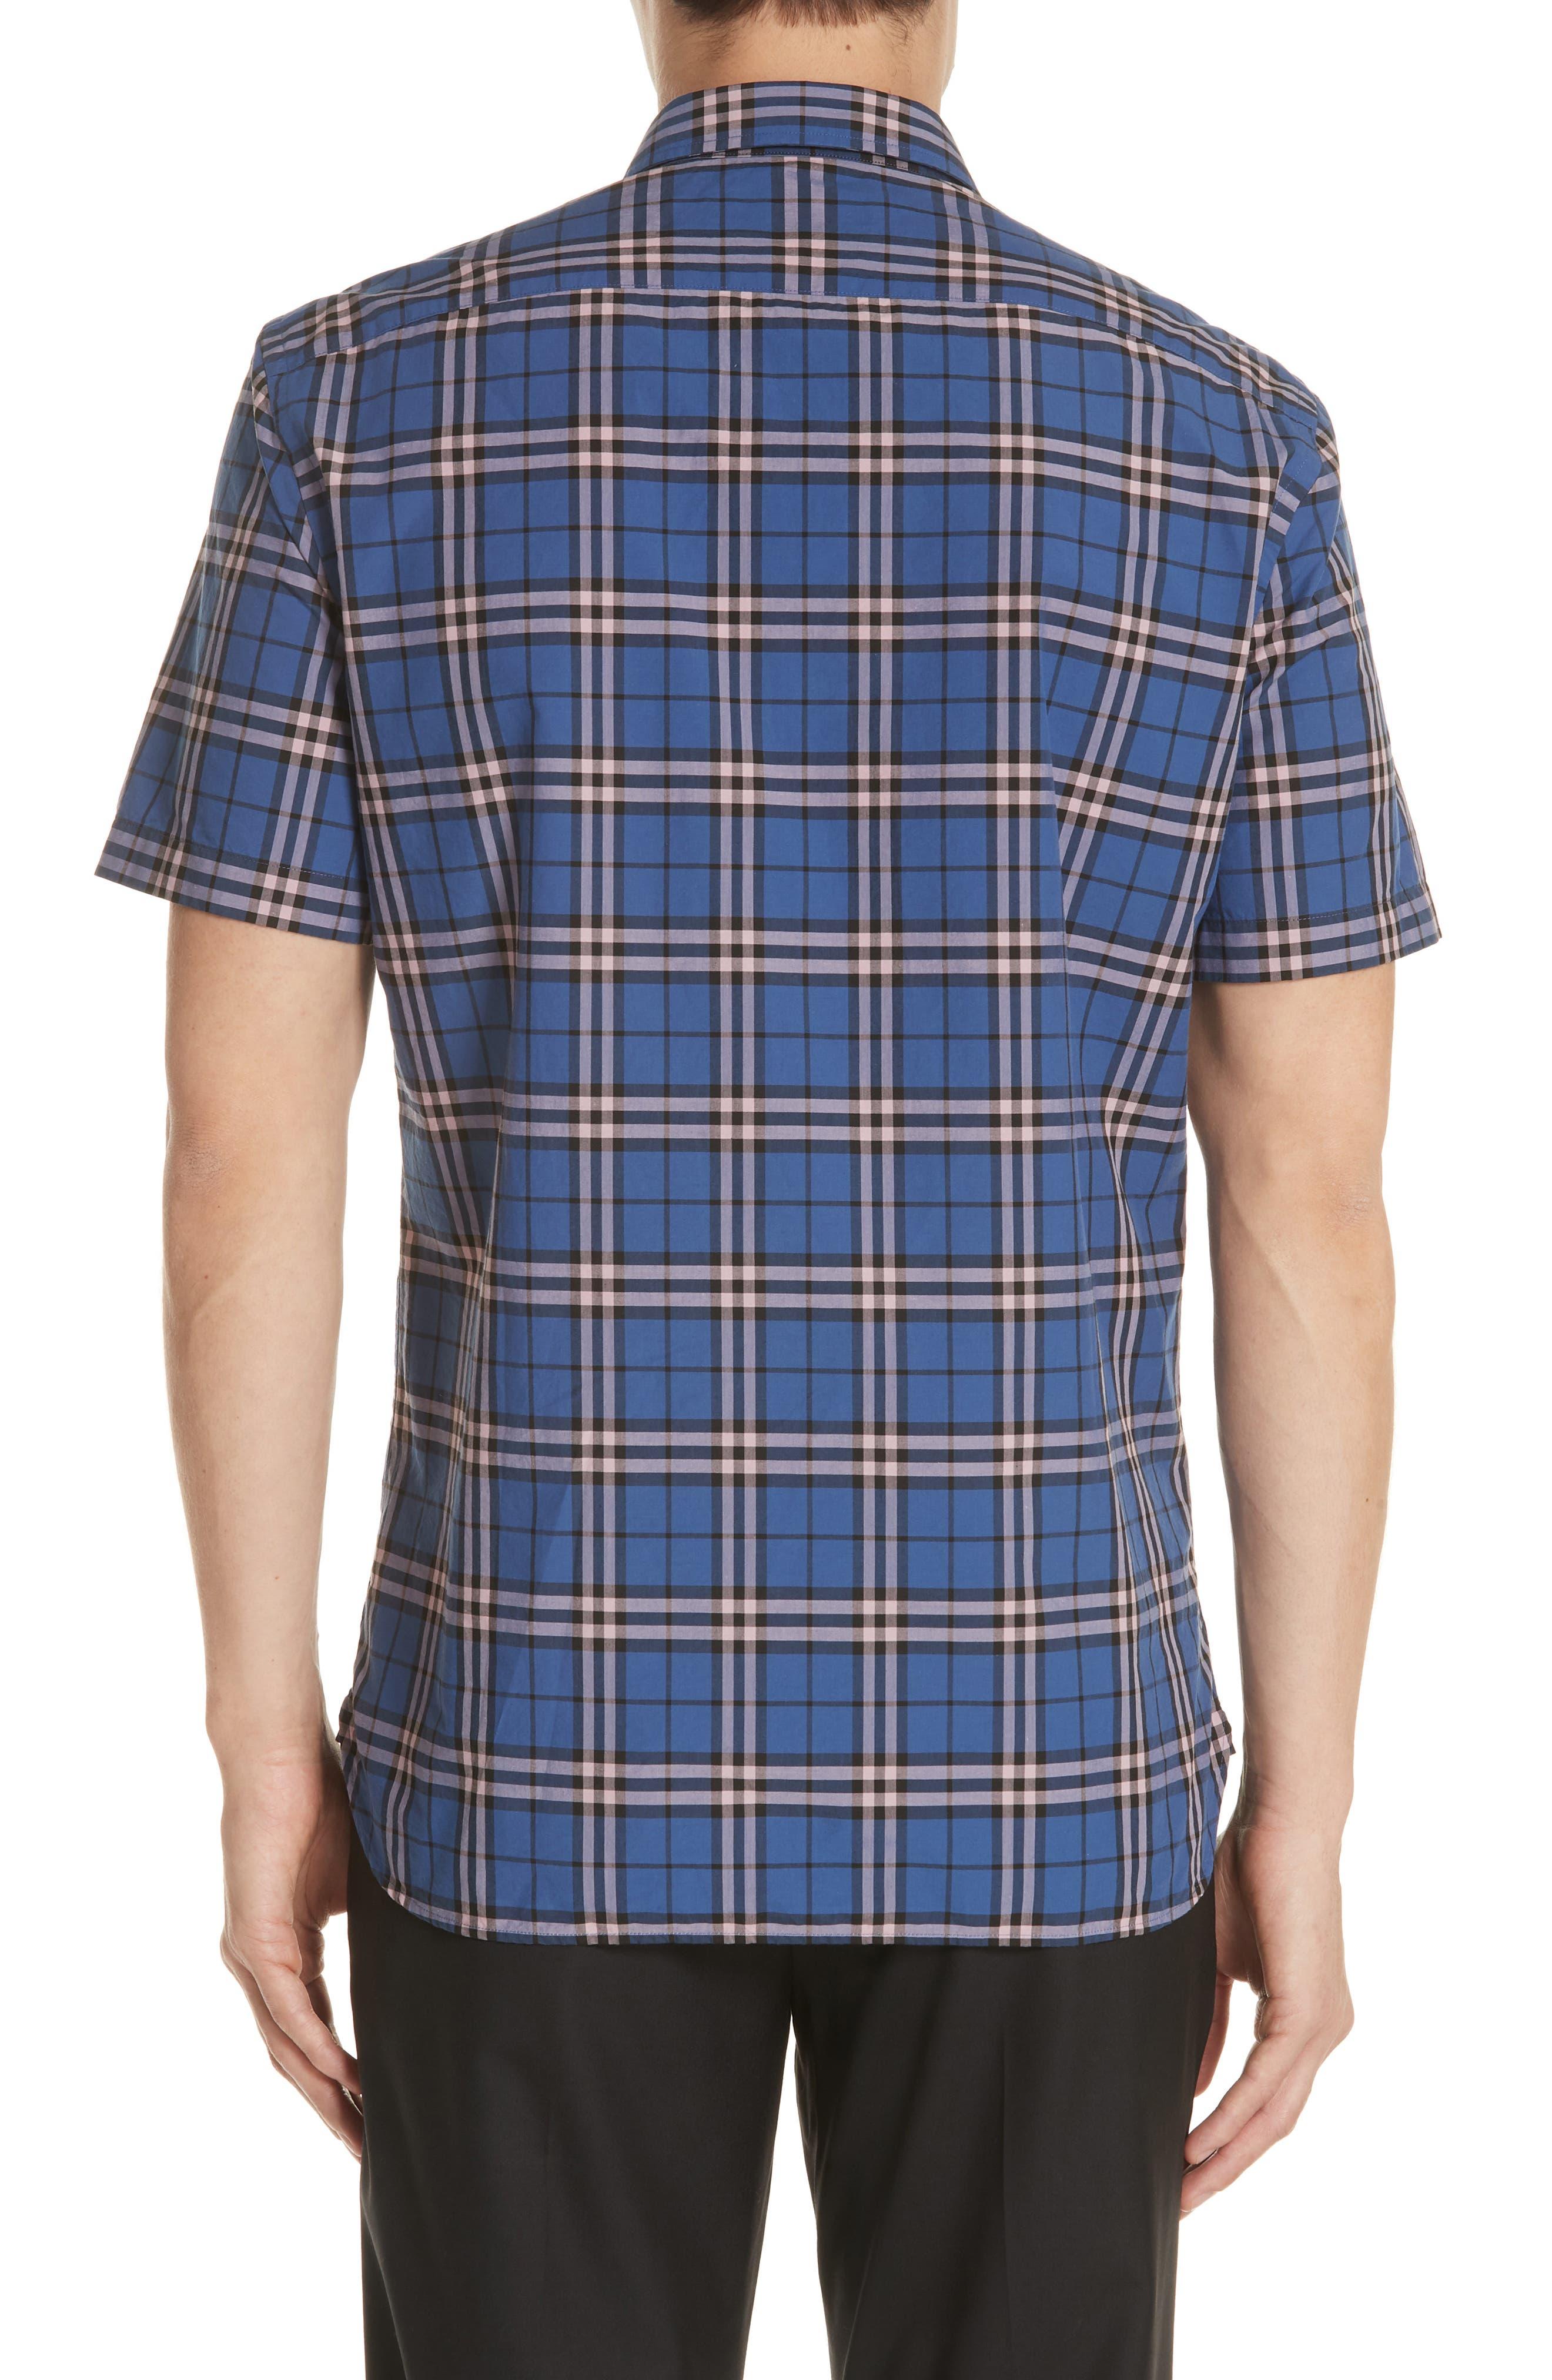 Alexander Check Shirt,                             Alternate thumbnail 2, color,                             409